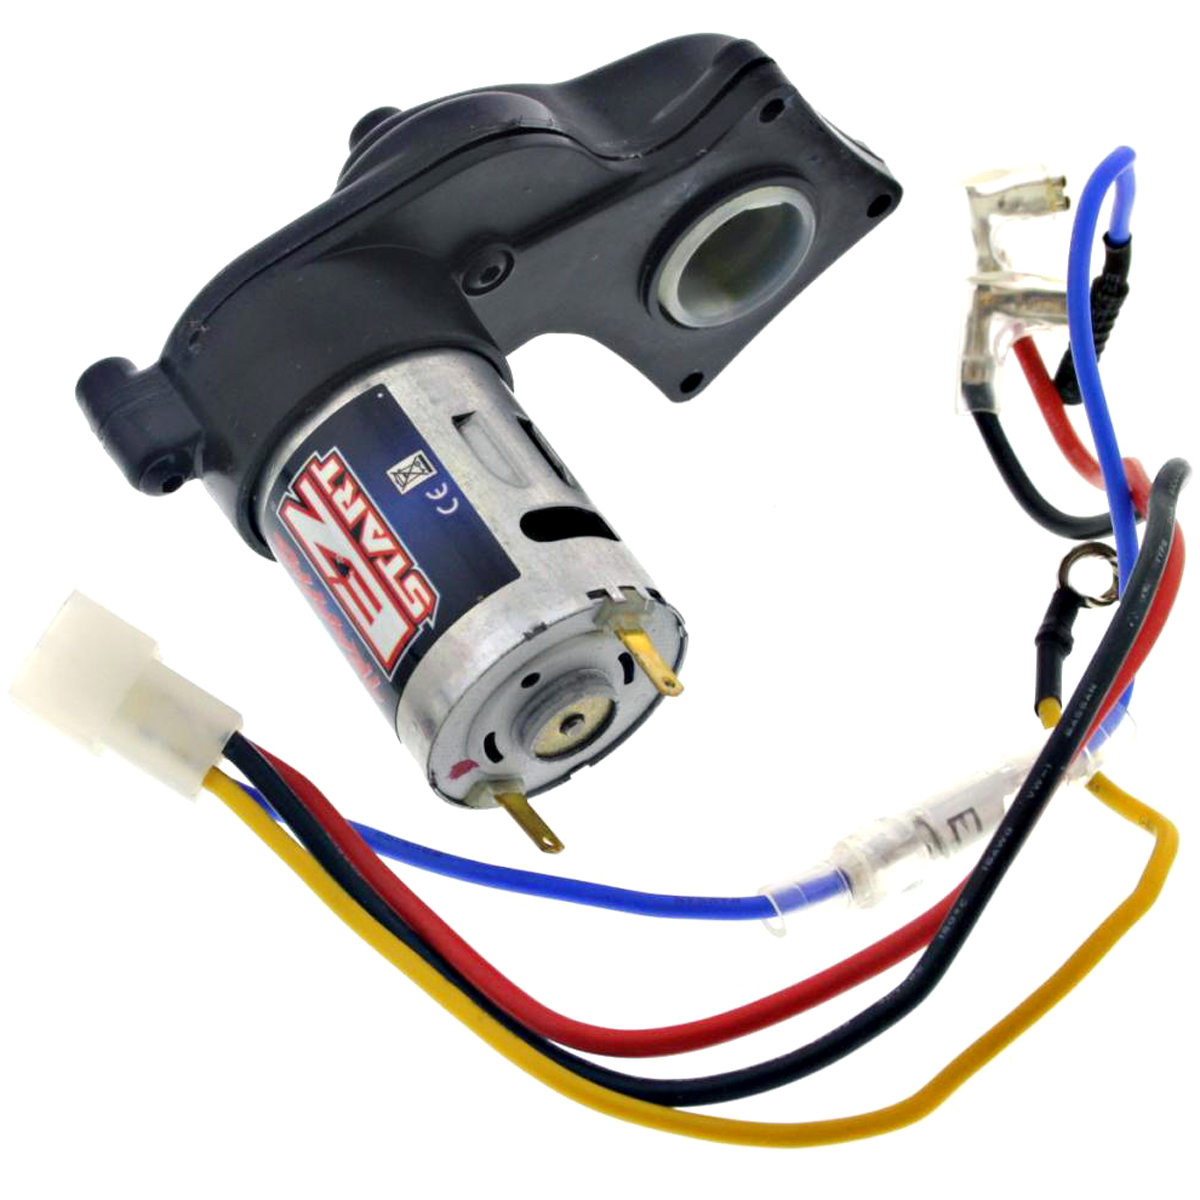 Traxxas Nitro Rustler 25 Ez Start Motor Gears Cush Drives Parts Diagram Click Thumbnails To Enlarge